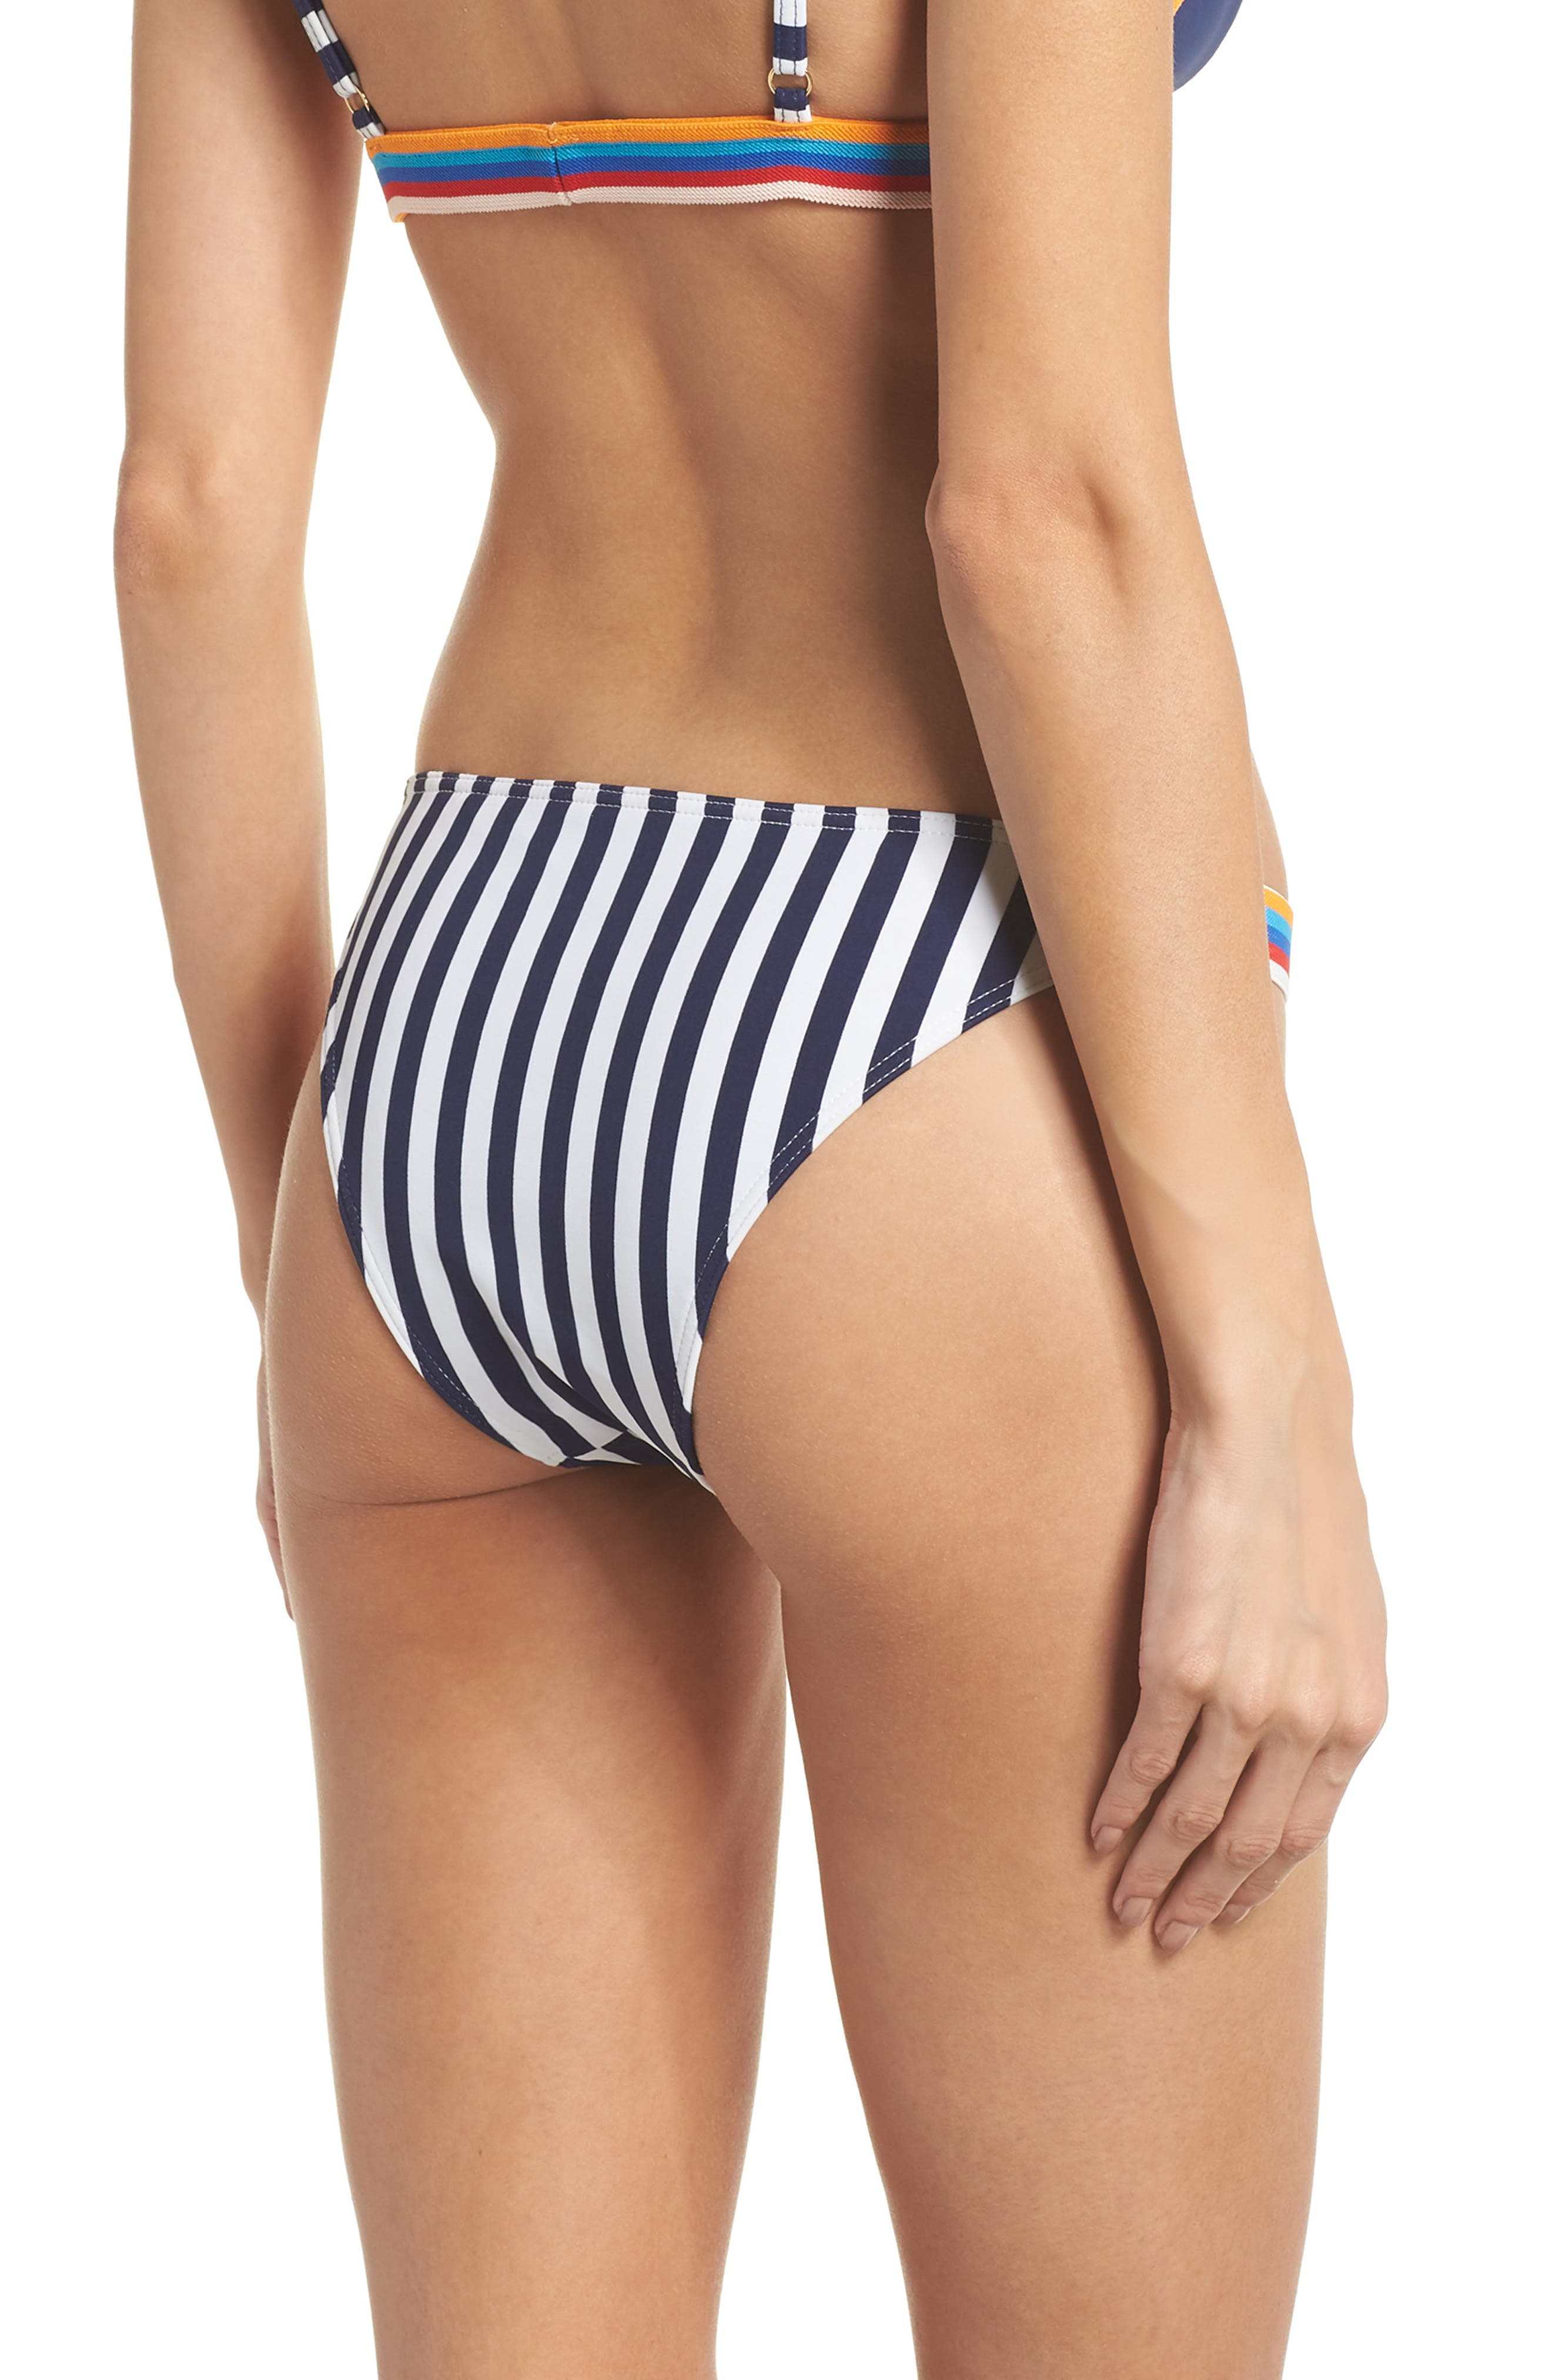 Sizzle Bikini Bottoms,                             Alternate thumbnail 2, color,                             Navy